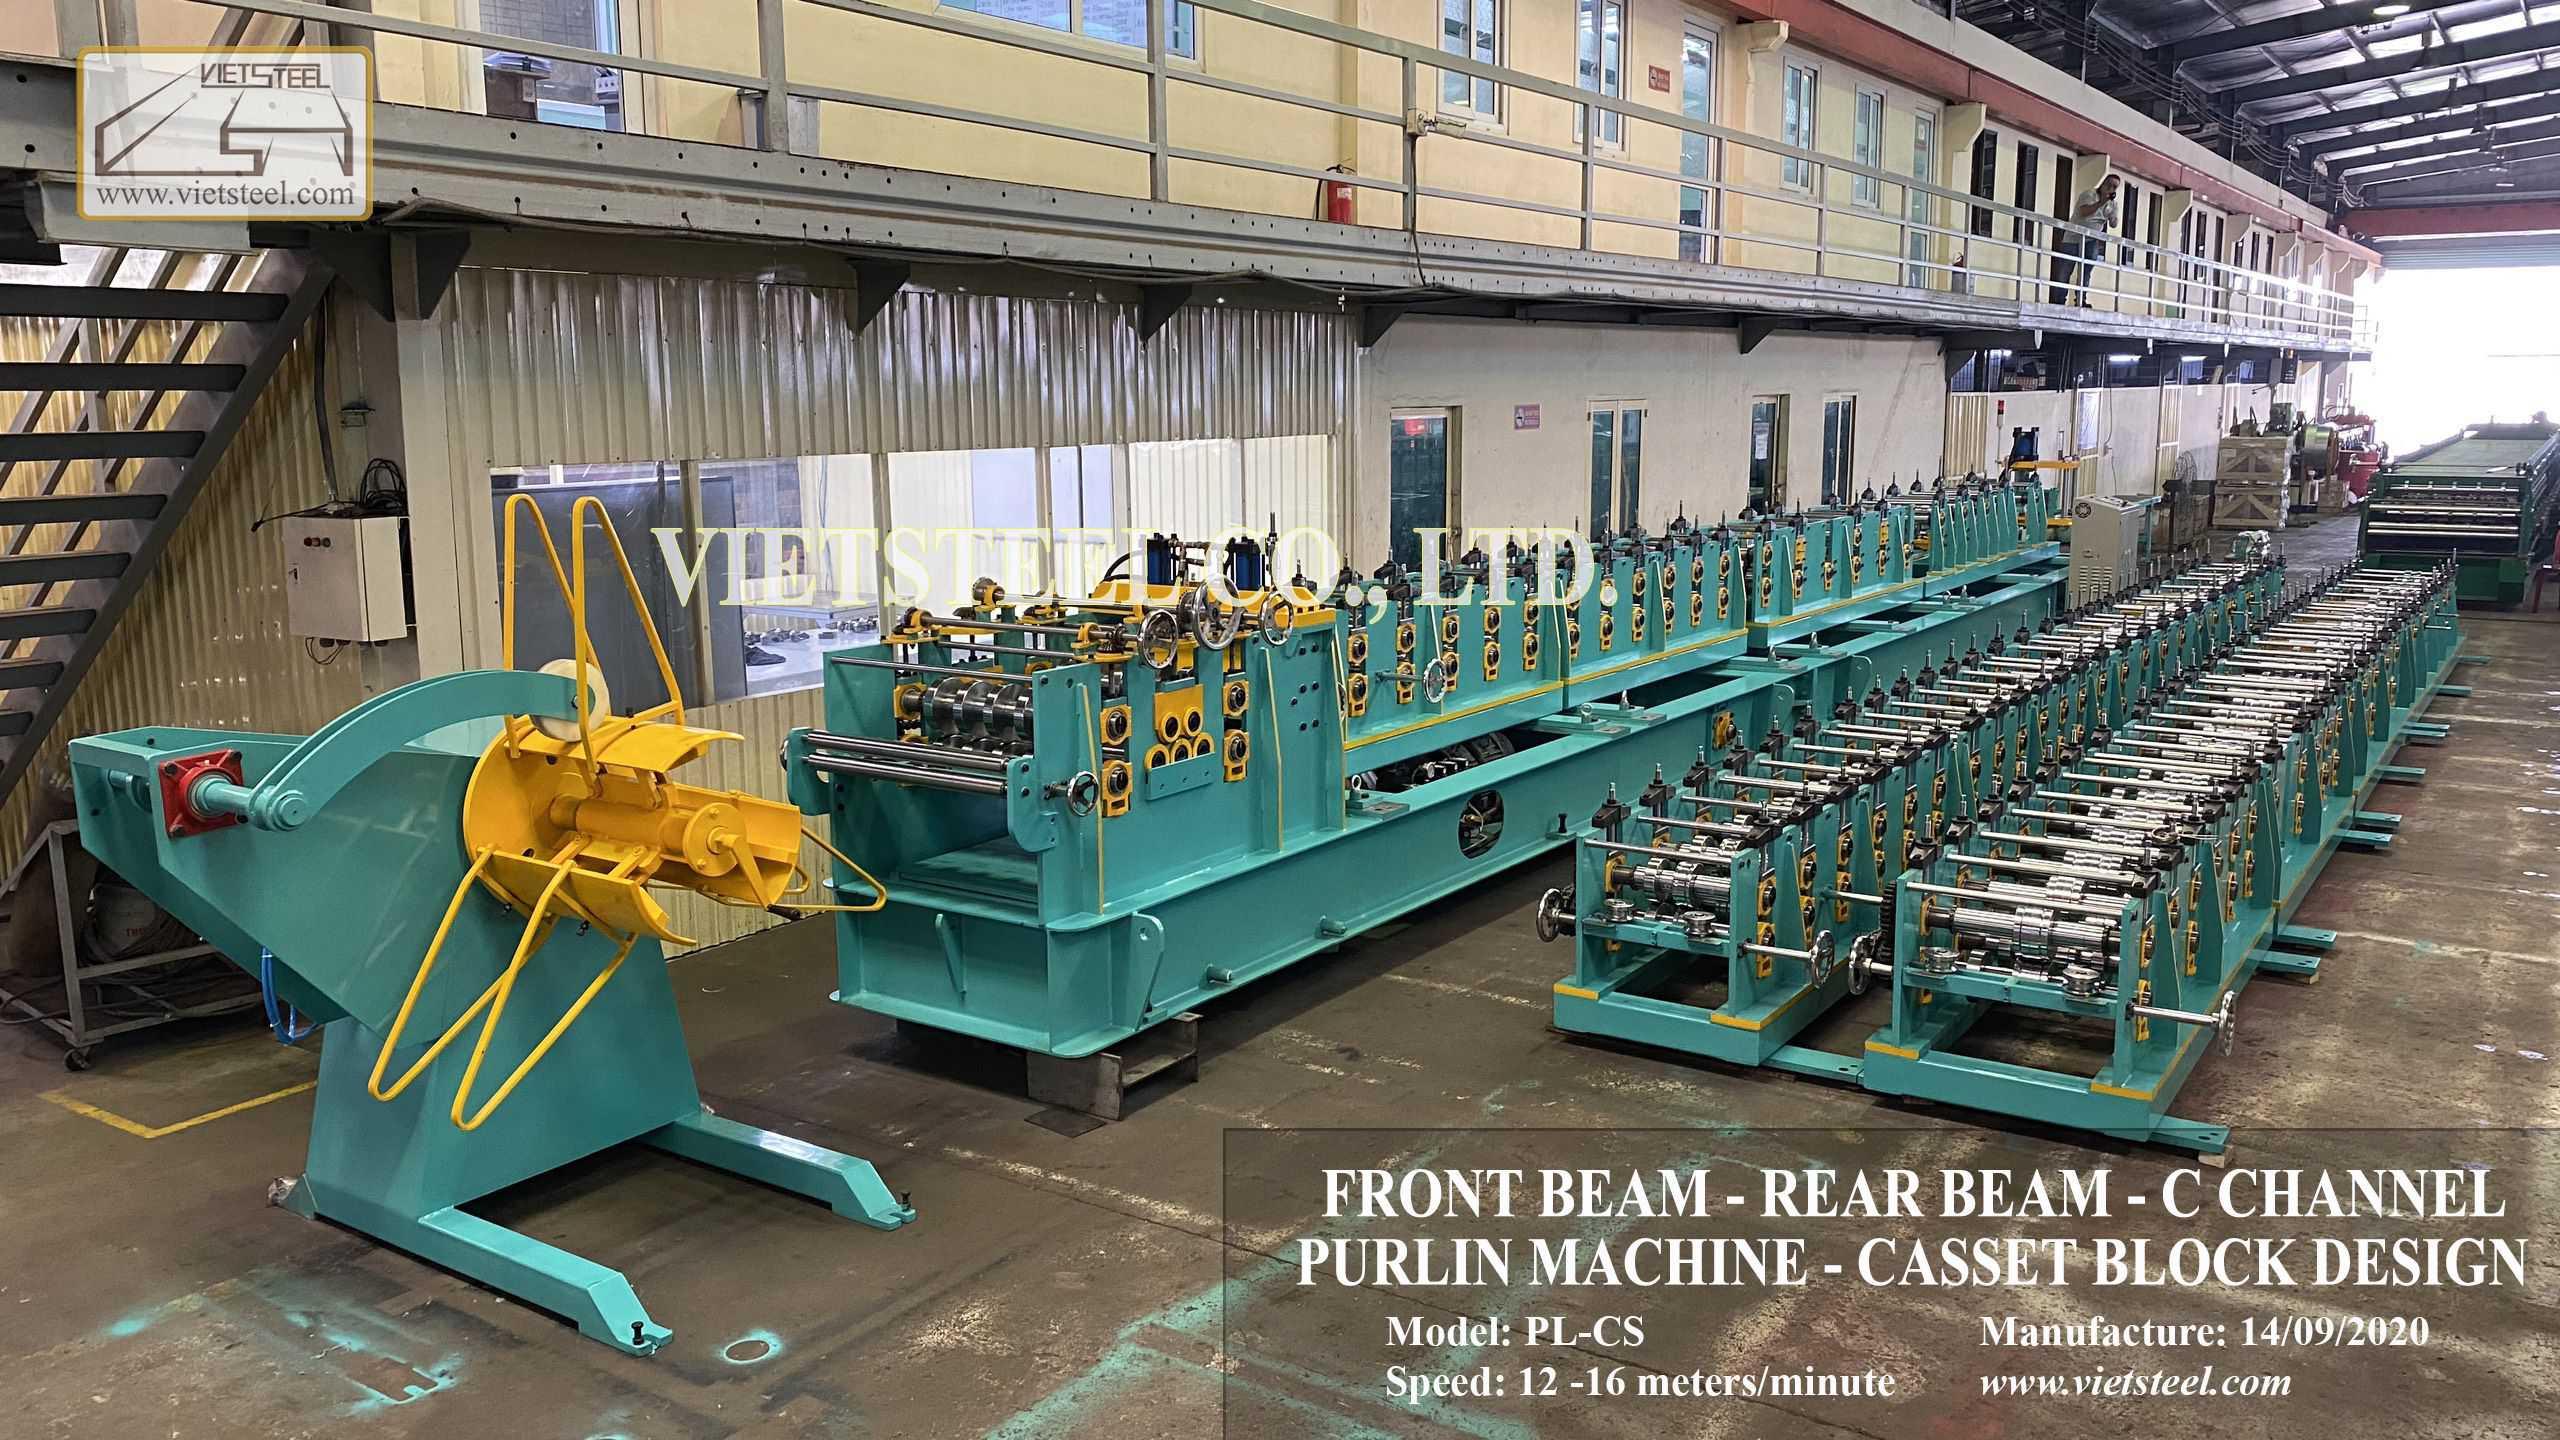 FRONT BEAM - REAR BEAM - C CHANNEL PURLIN MACHINE - CASSET BLOCK DESIGN Vietsteel